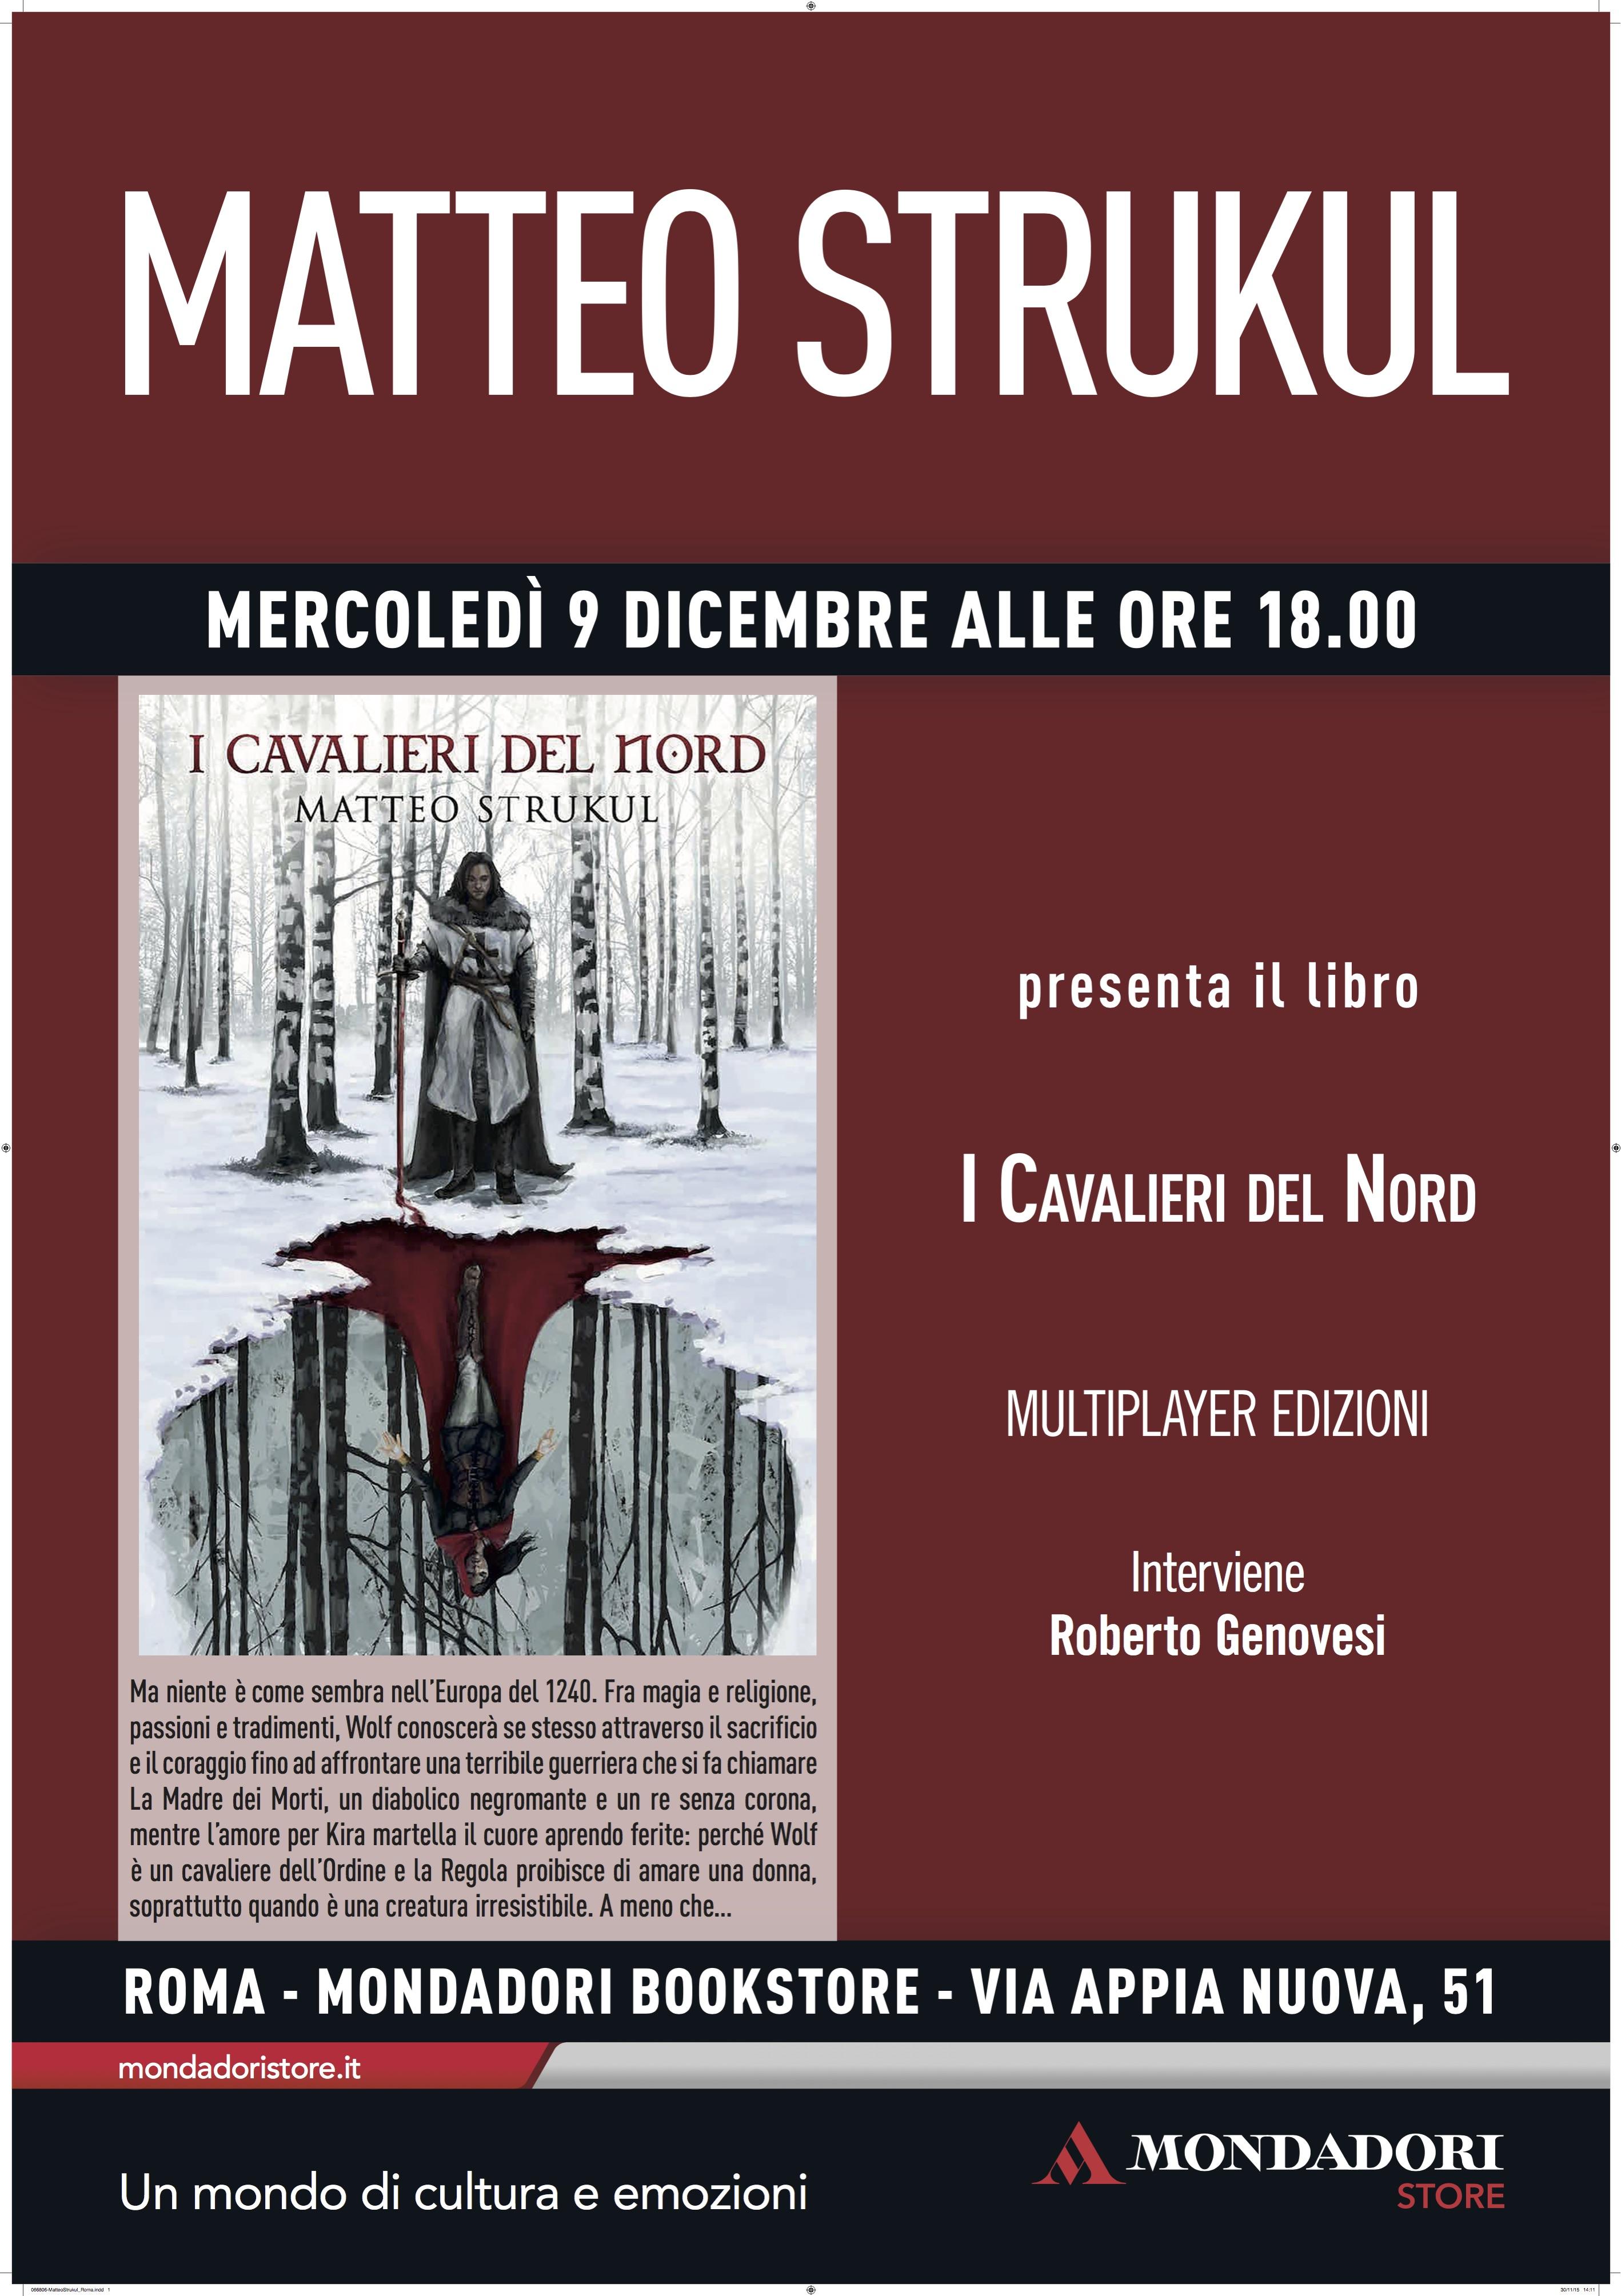 Mondadori - I Cavalieri Del Nord